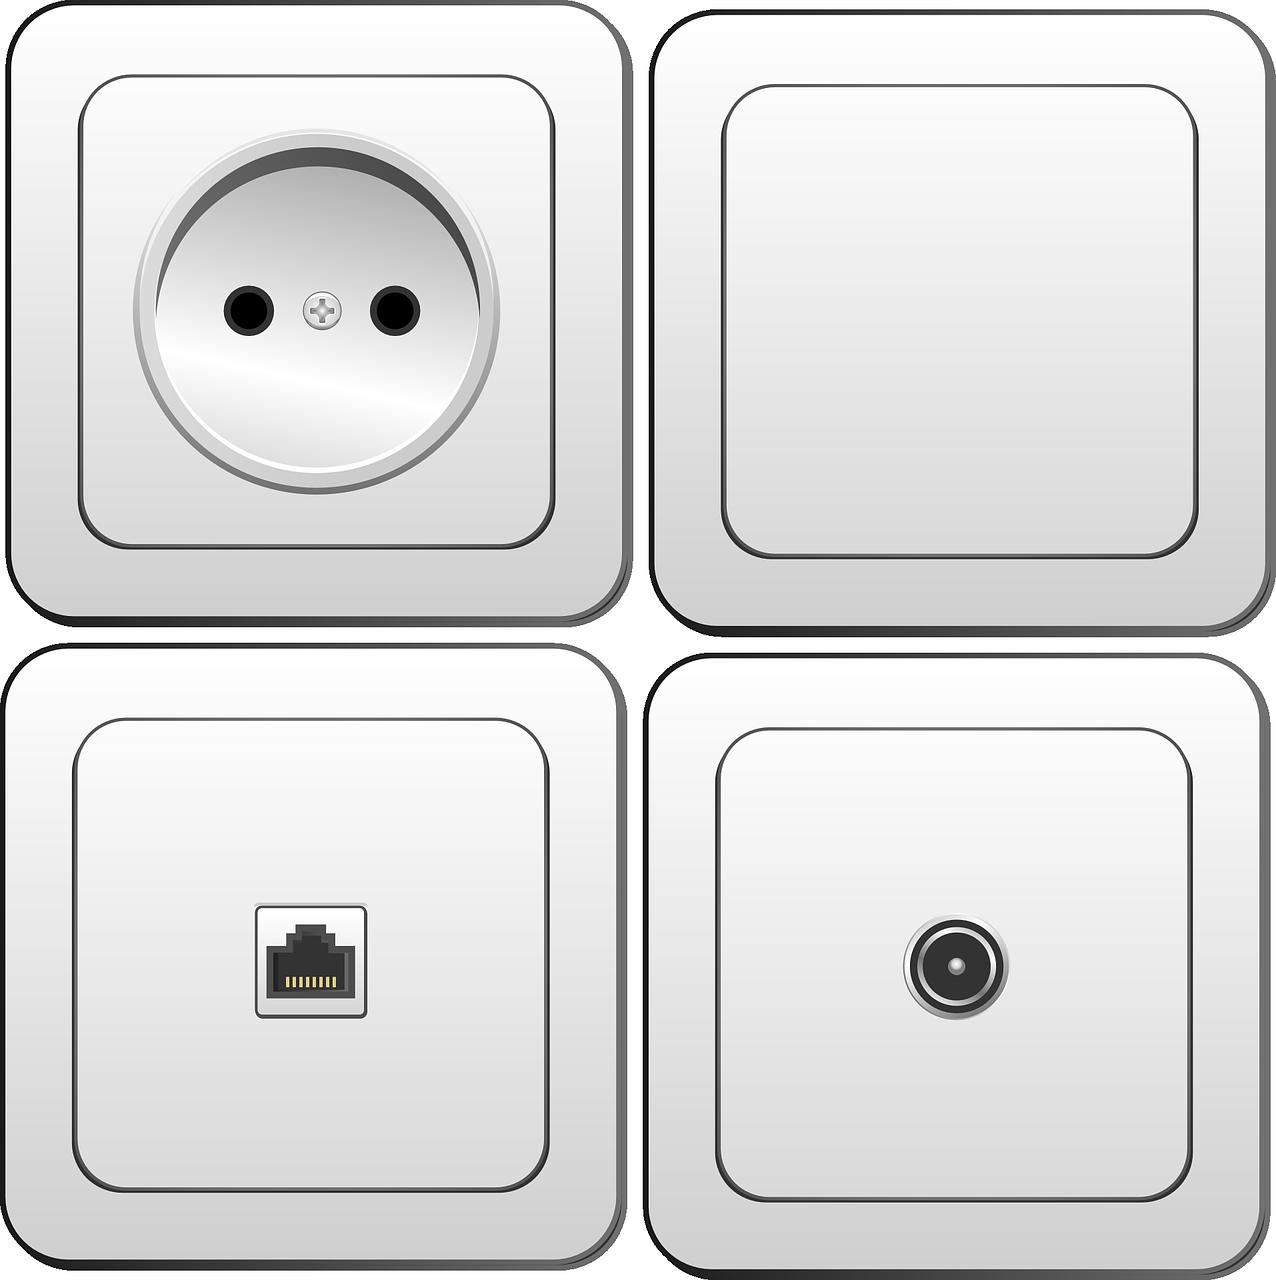 electronics-160065_1280